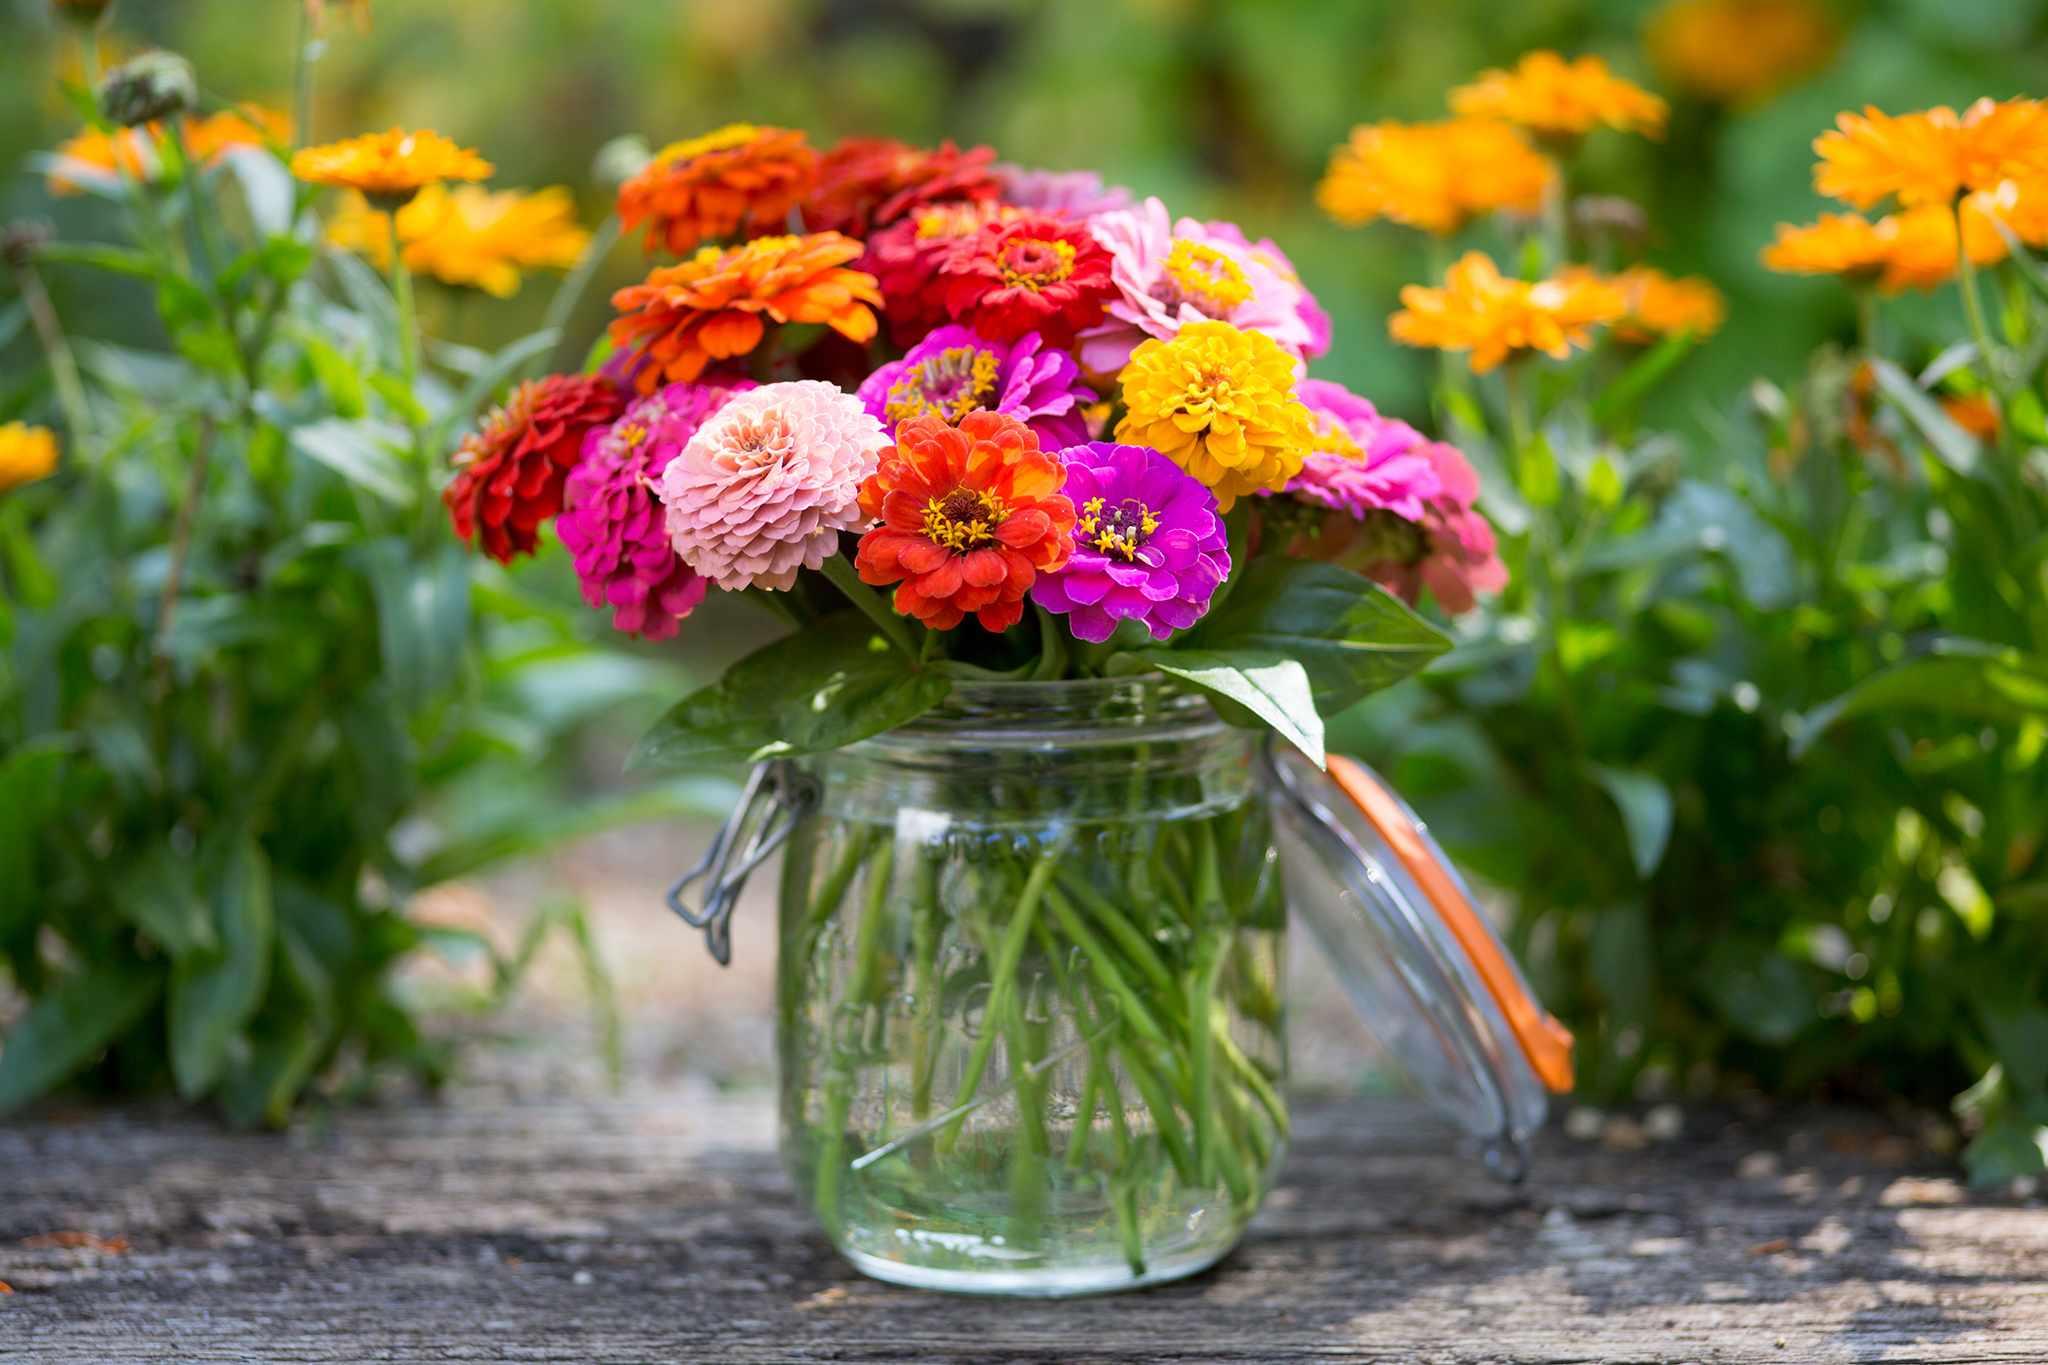 Zinnia cut flower display